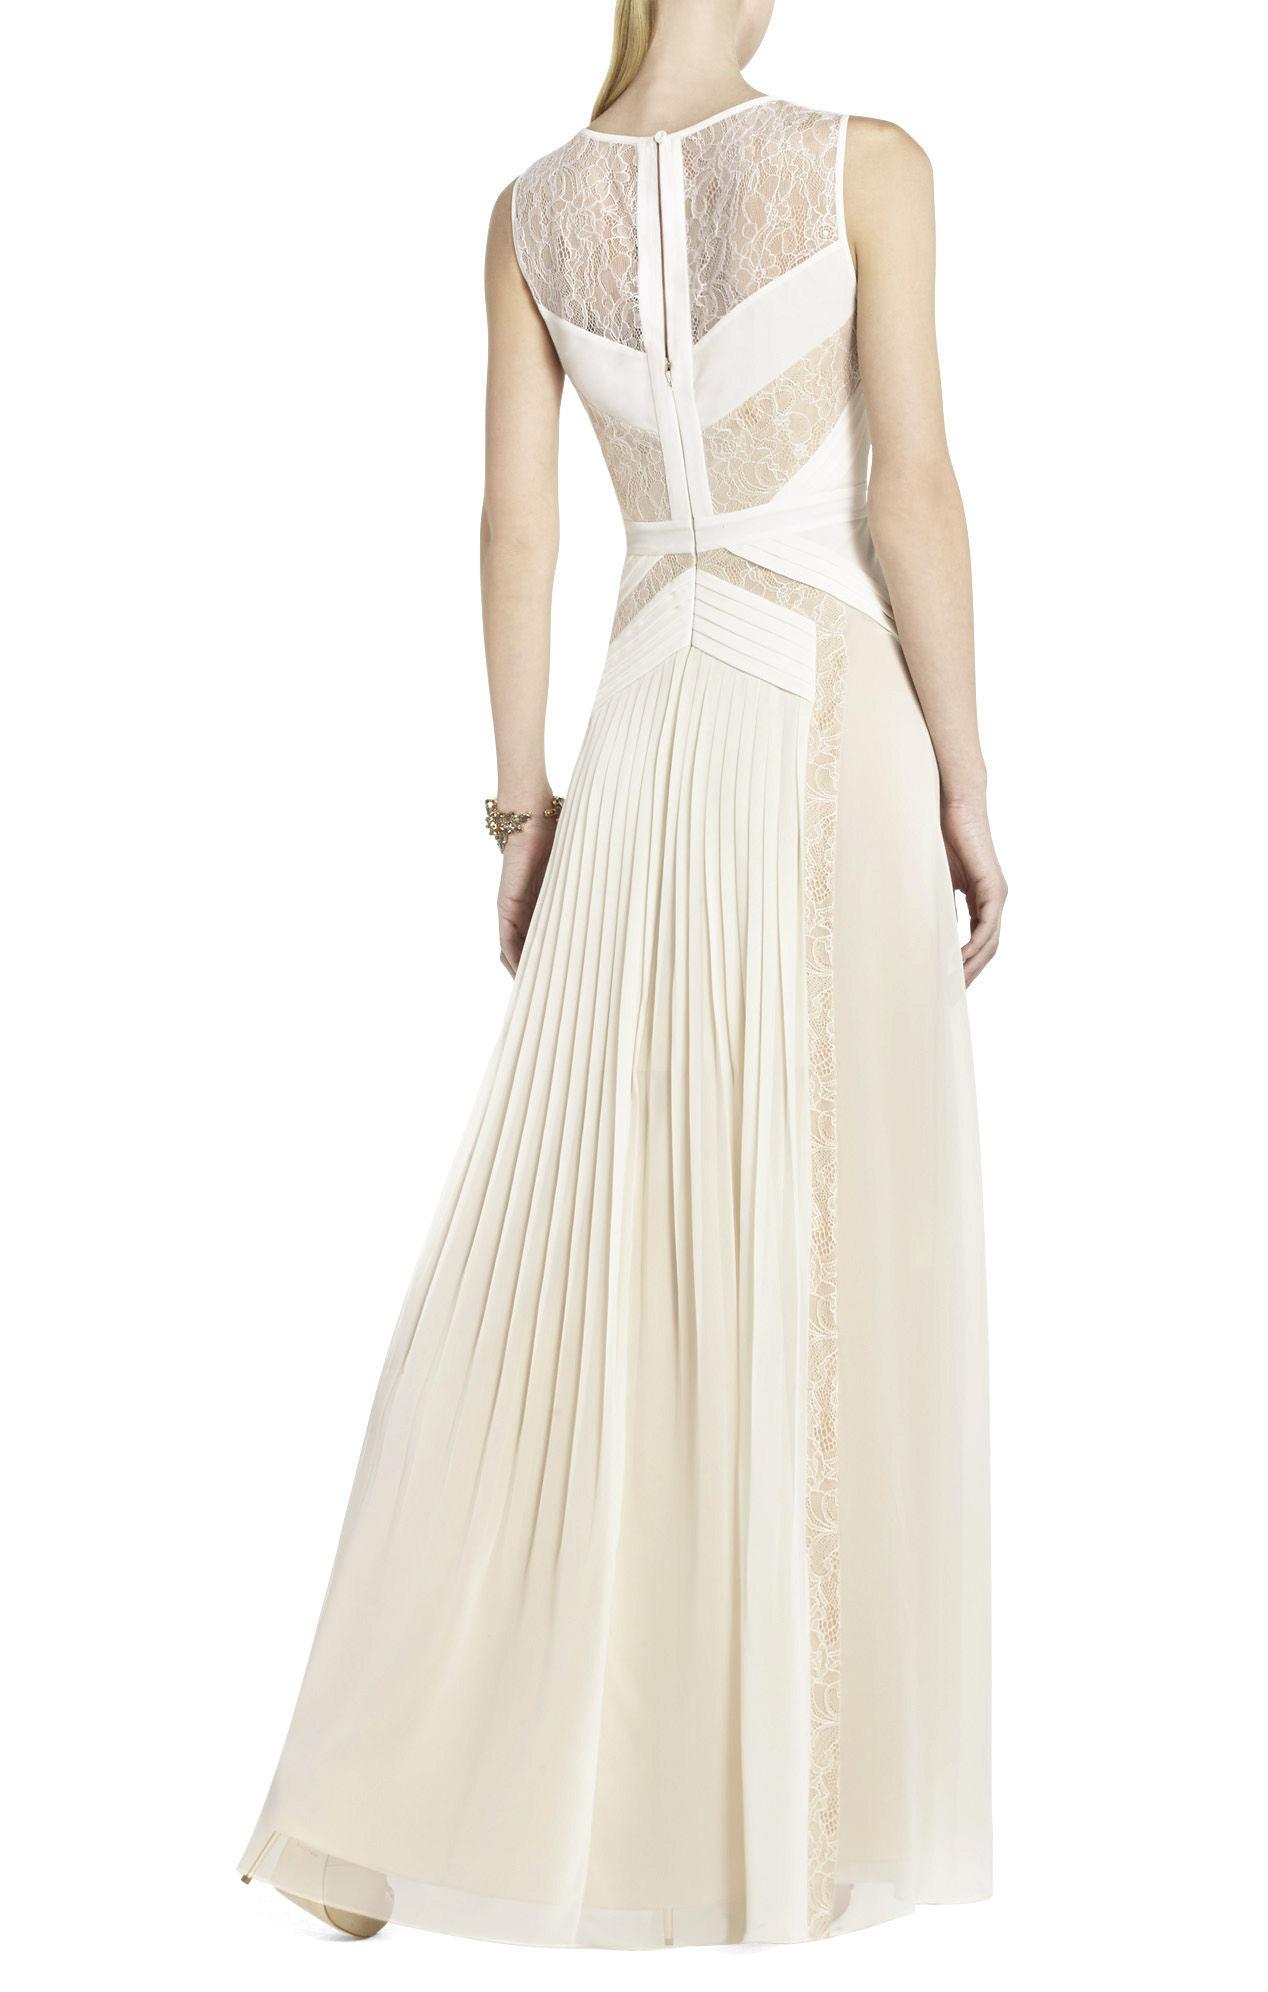 Lyst - Bcbgmaxazria Avi Pleated Gown in White